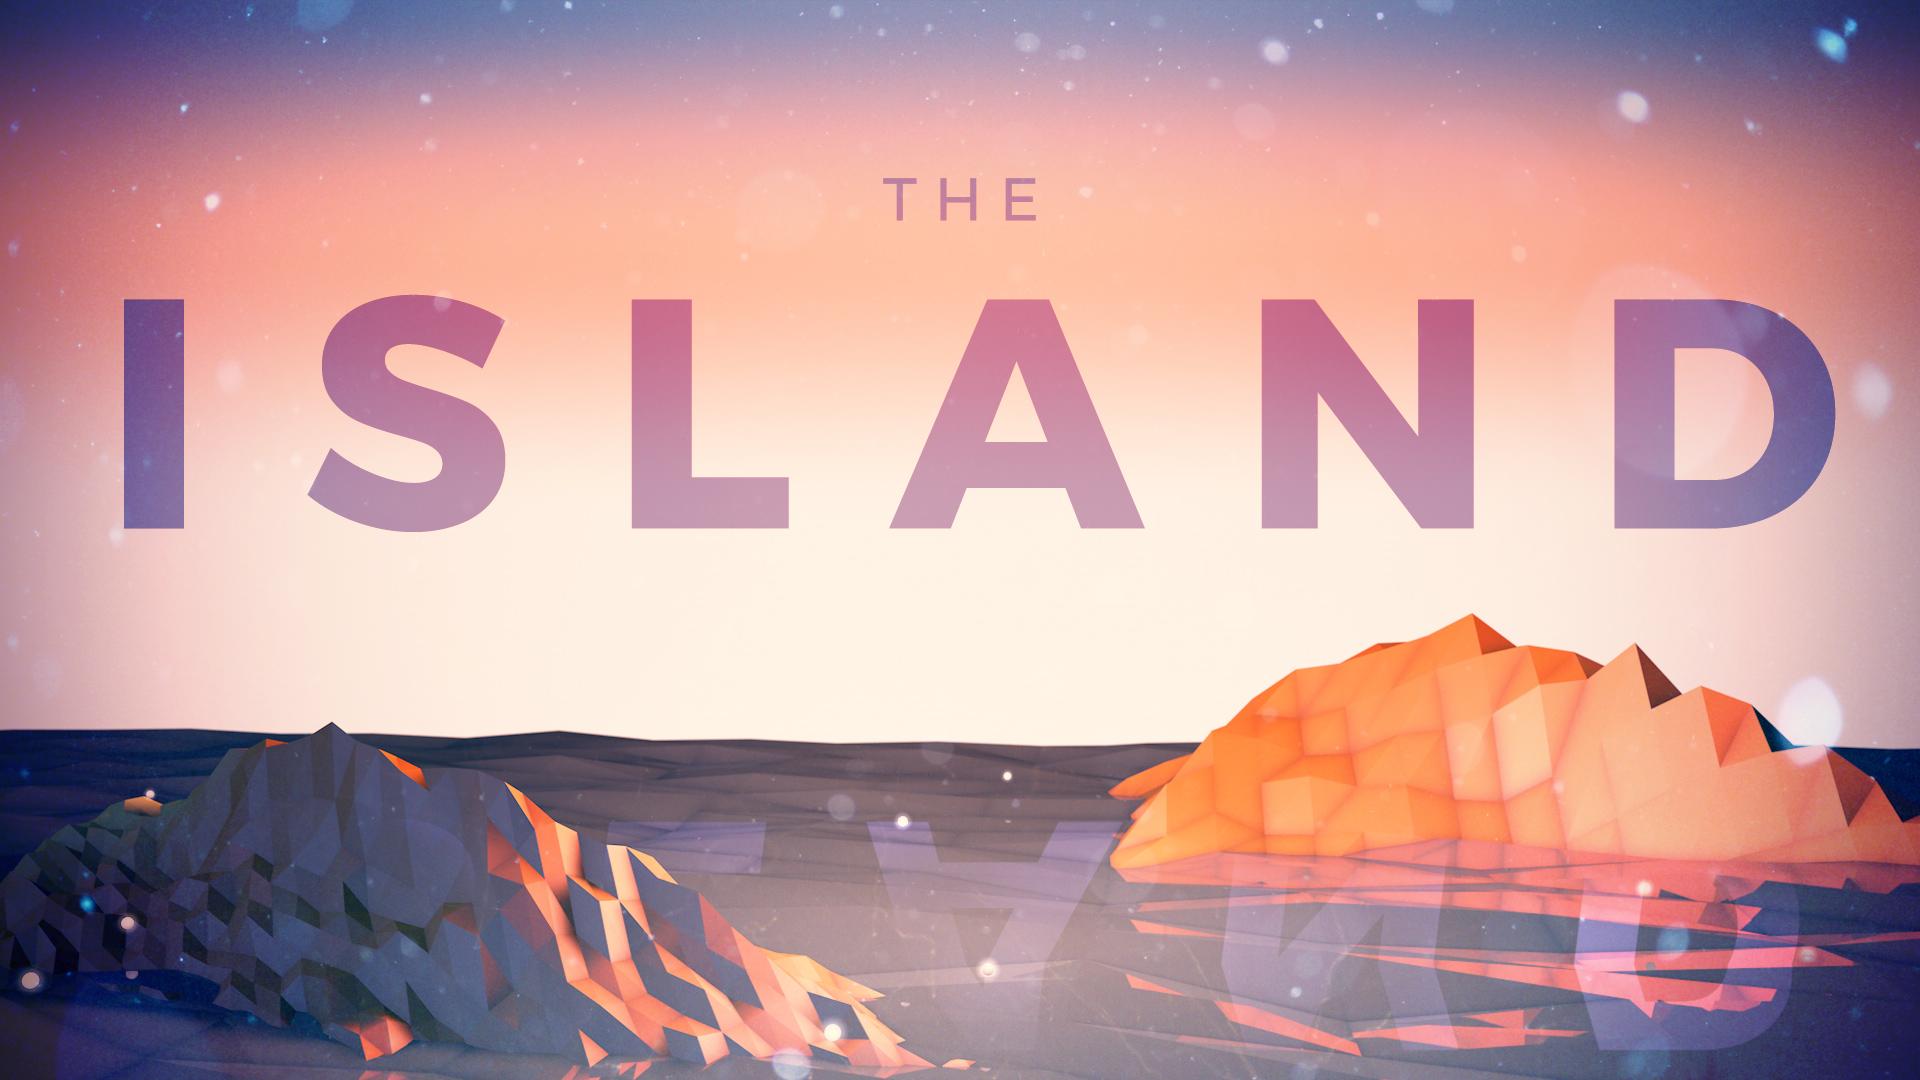 the-island-01-06.jpg